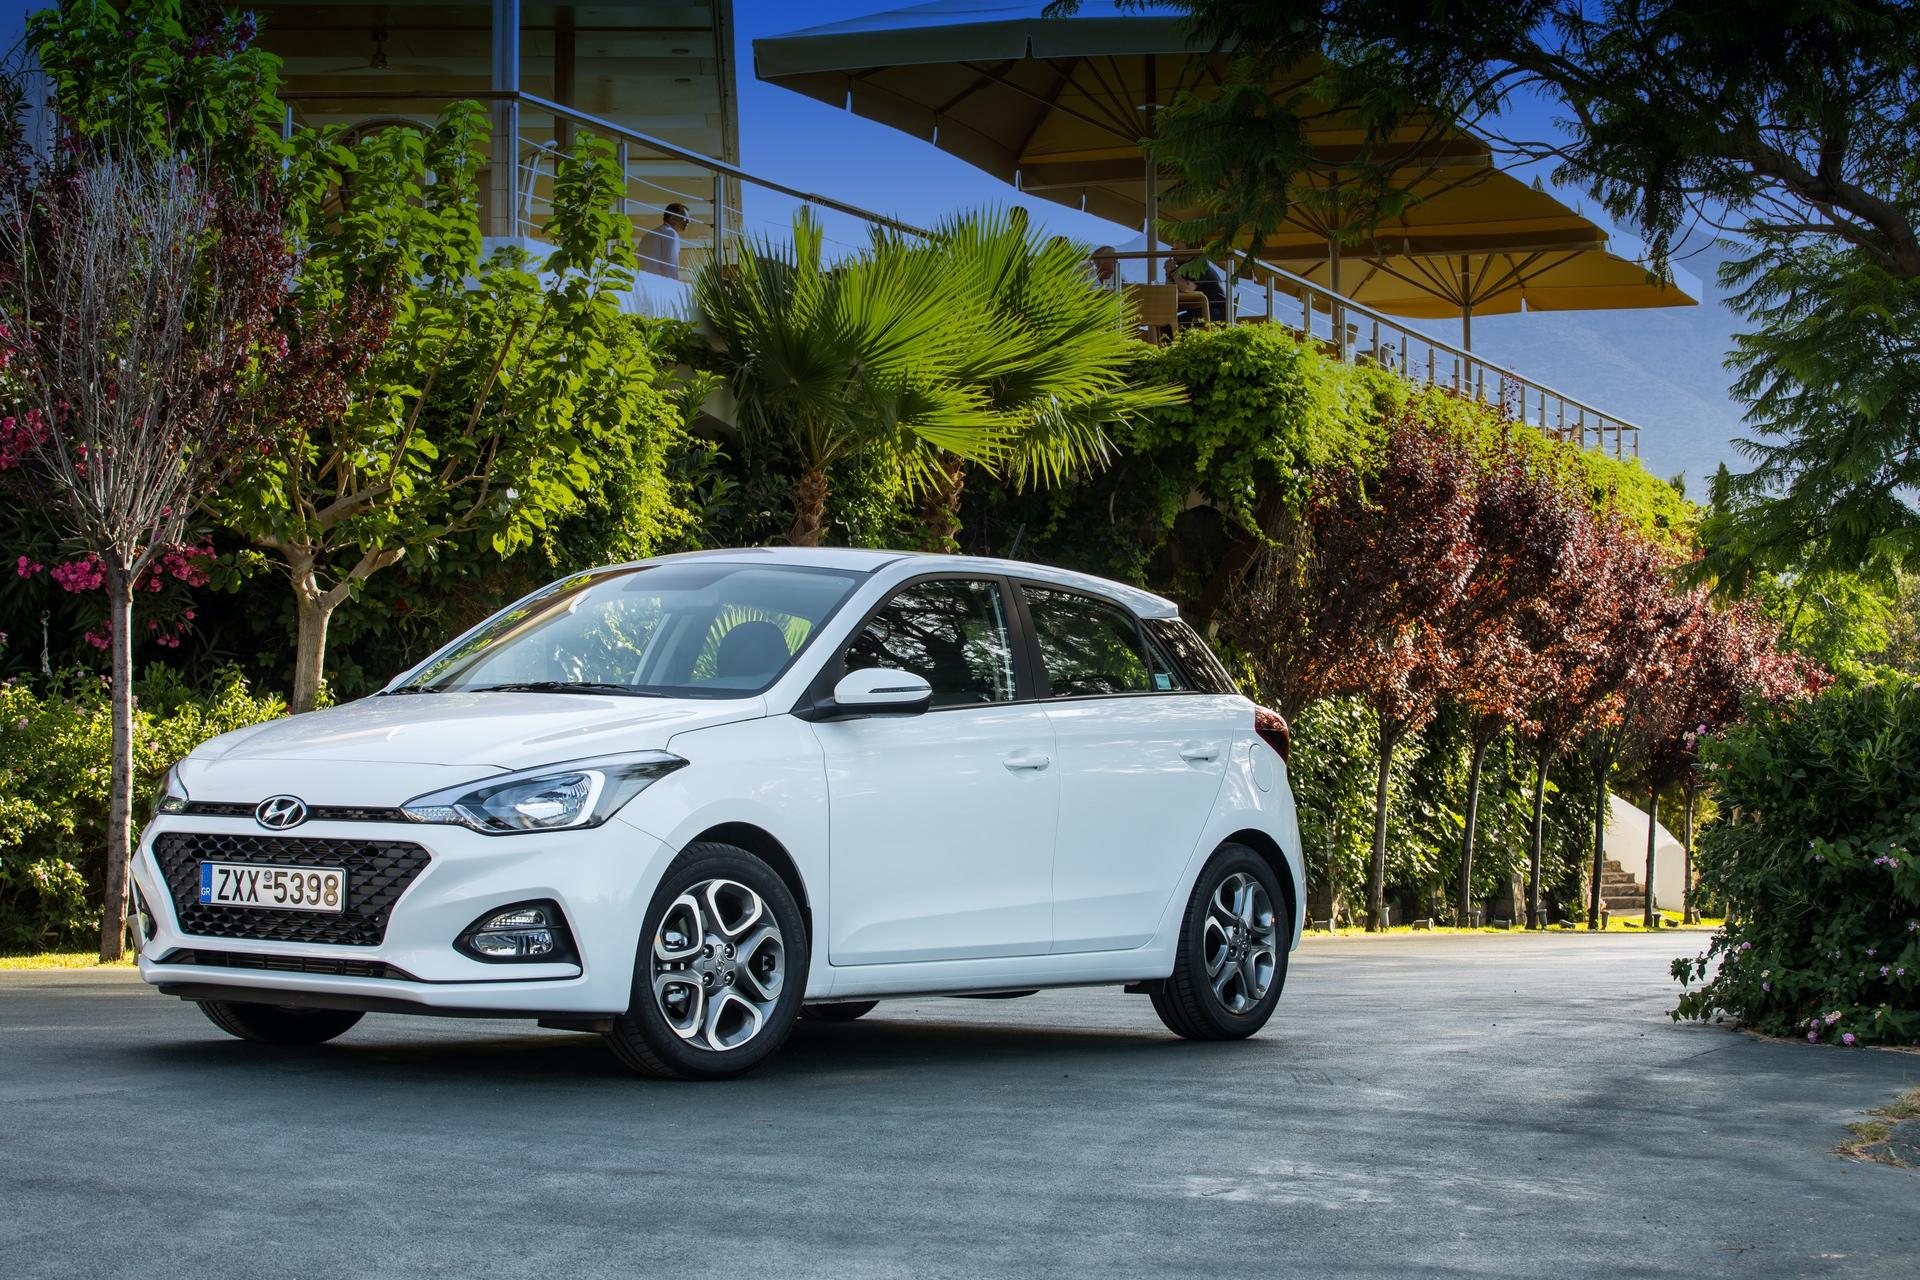 Hyundai_i20_facelift_greek_presskit_0003